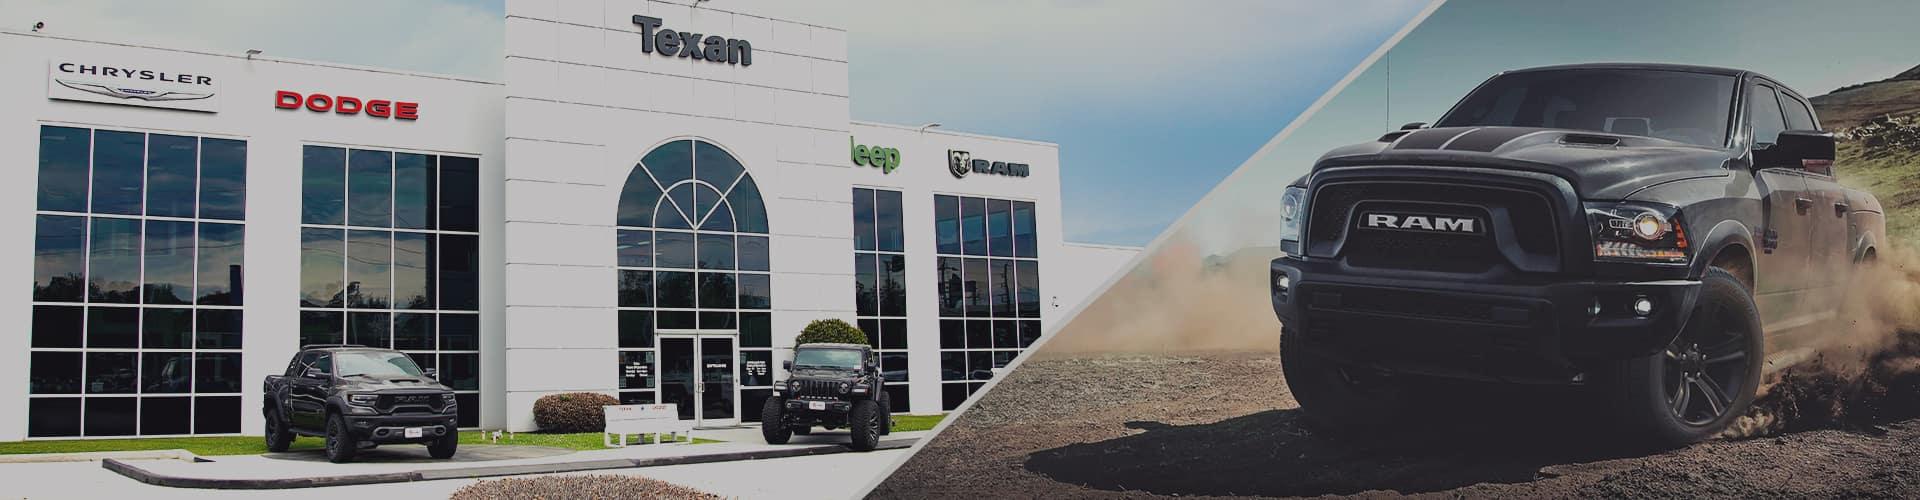 dodge dealership humble Dodge Chrysler Jeep RAM Dealer Houston TX  New & Used Cars